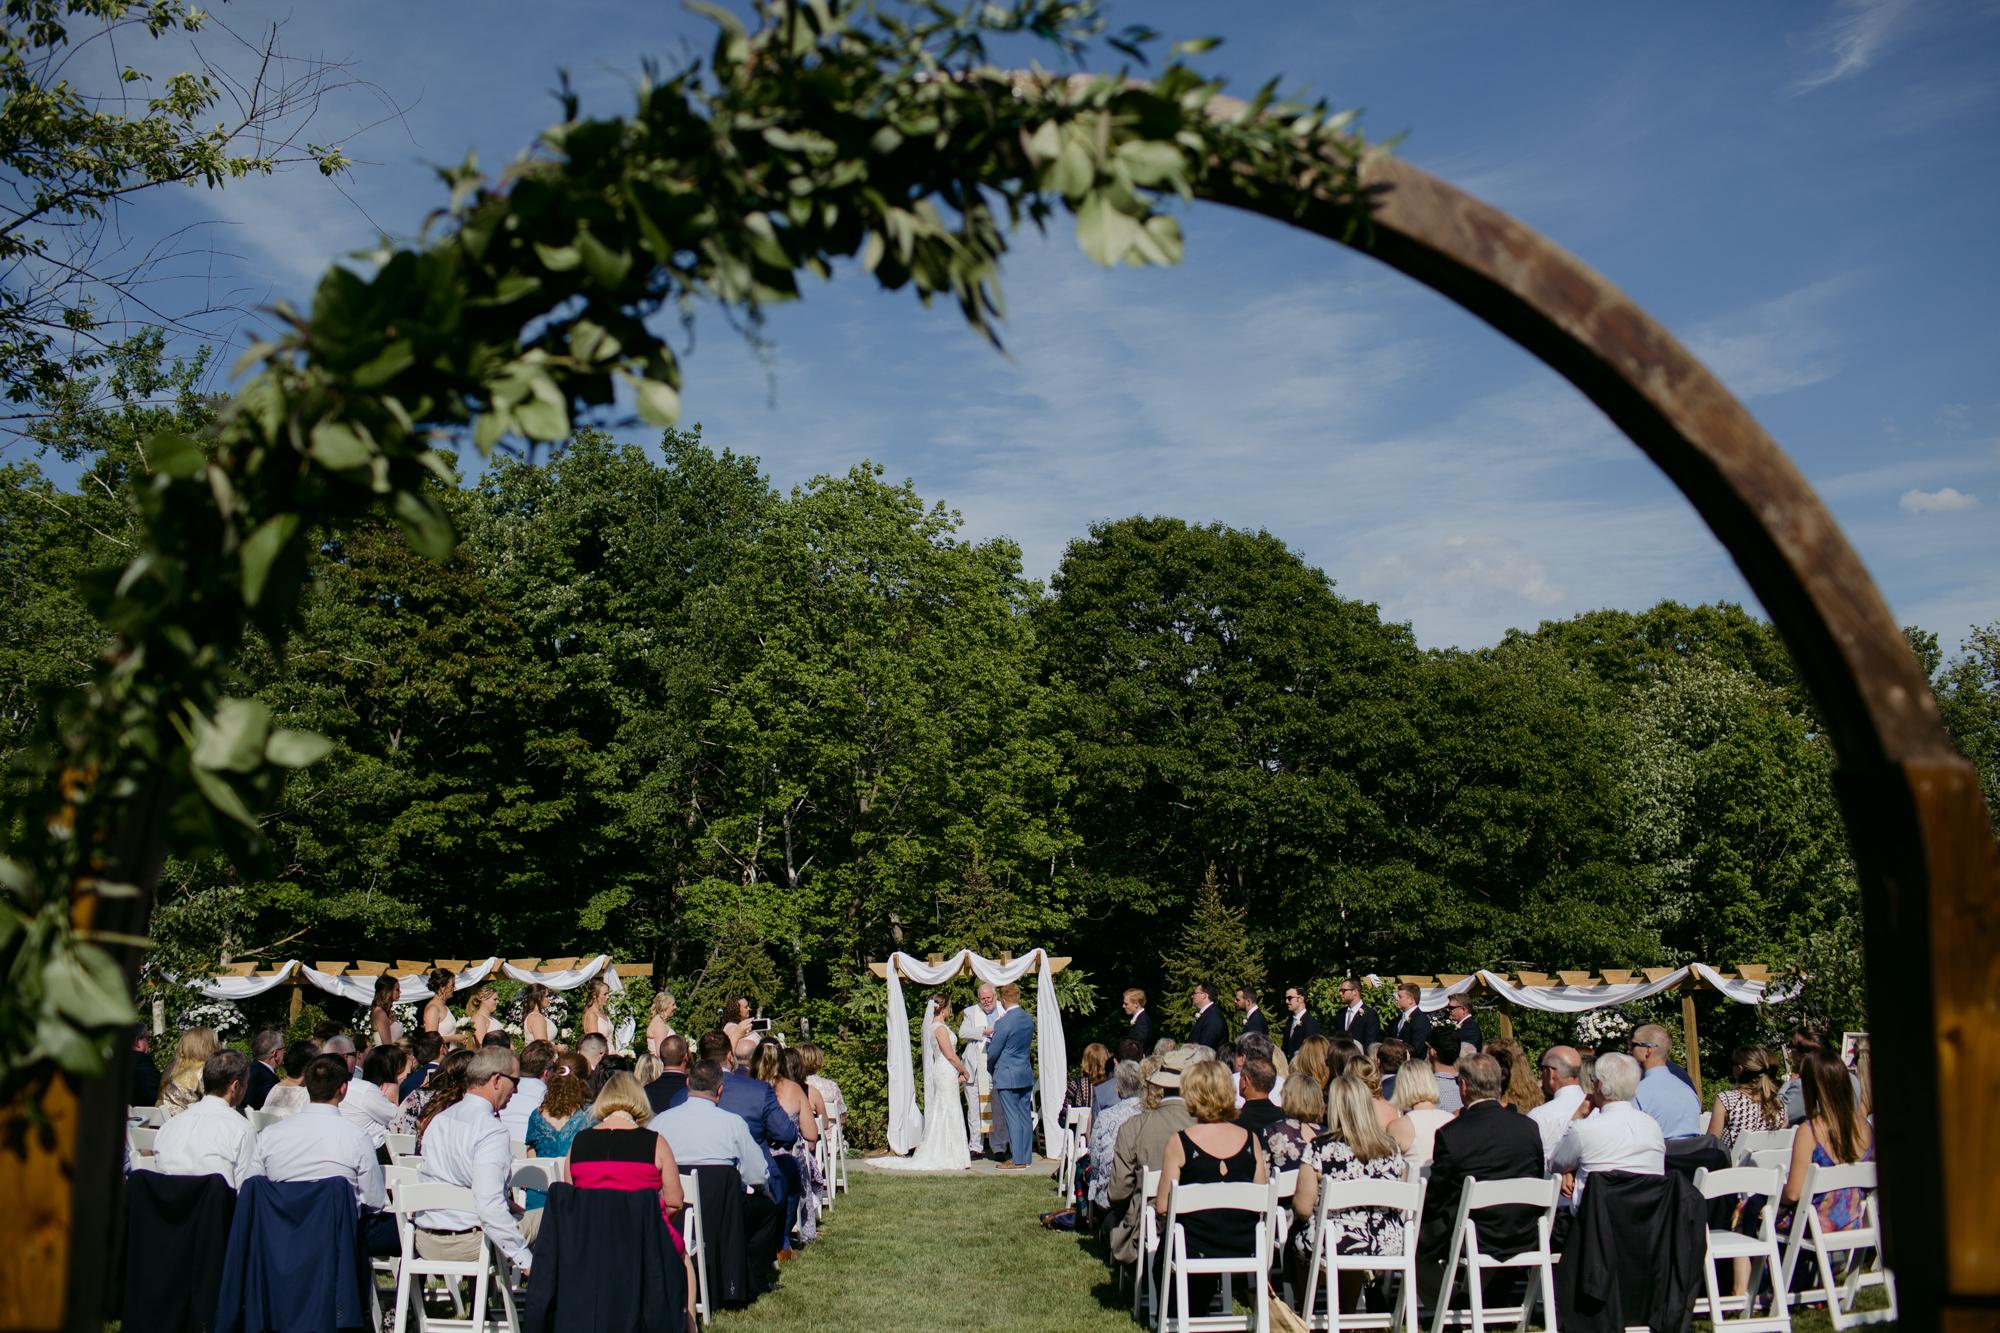 Livewell_Farm_wedding_Harpswell_maine_Meghan_Jim_013.jpg